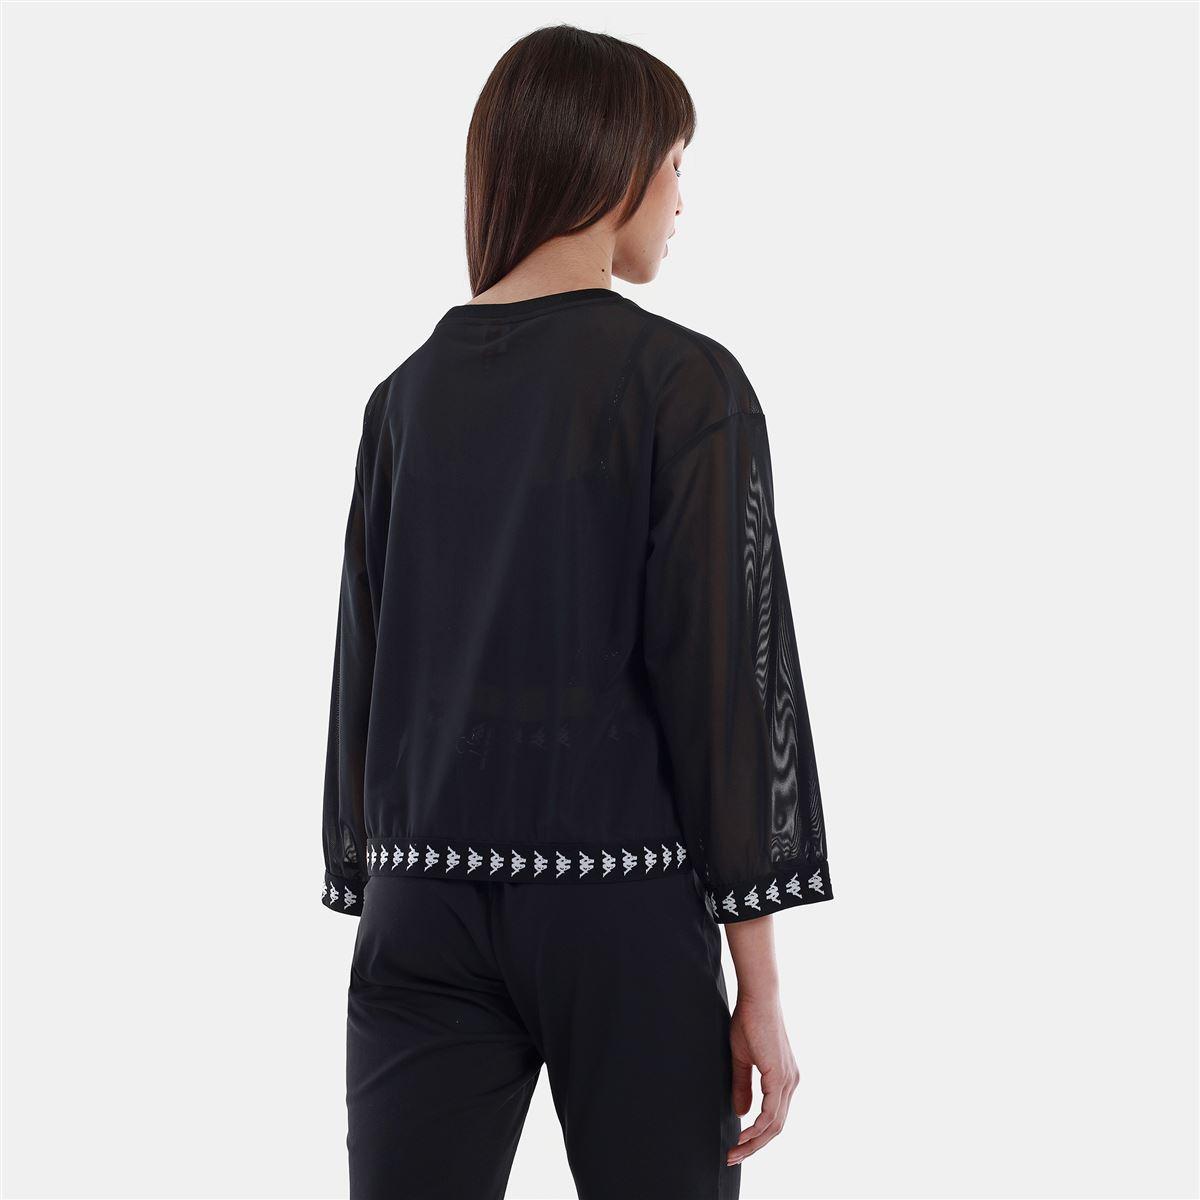 T-shirt donna in rete trasparente Kappa   T-shirt   3117CHWBZB BLACK-WHITE-BLACK